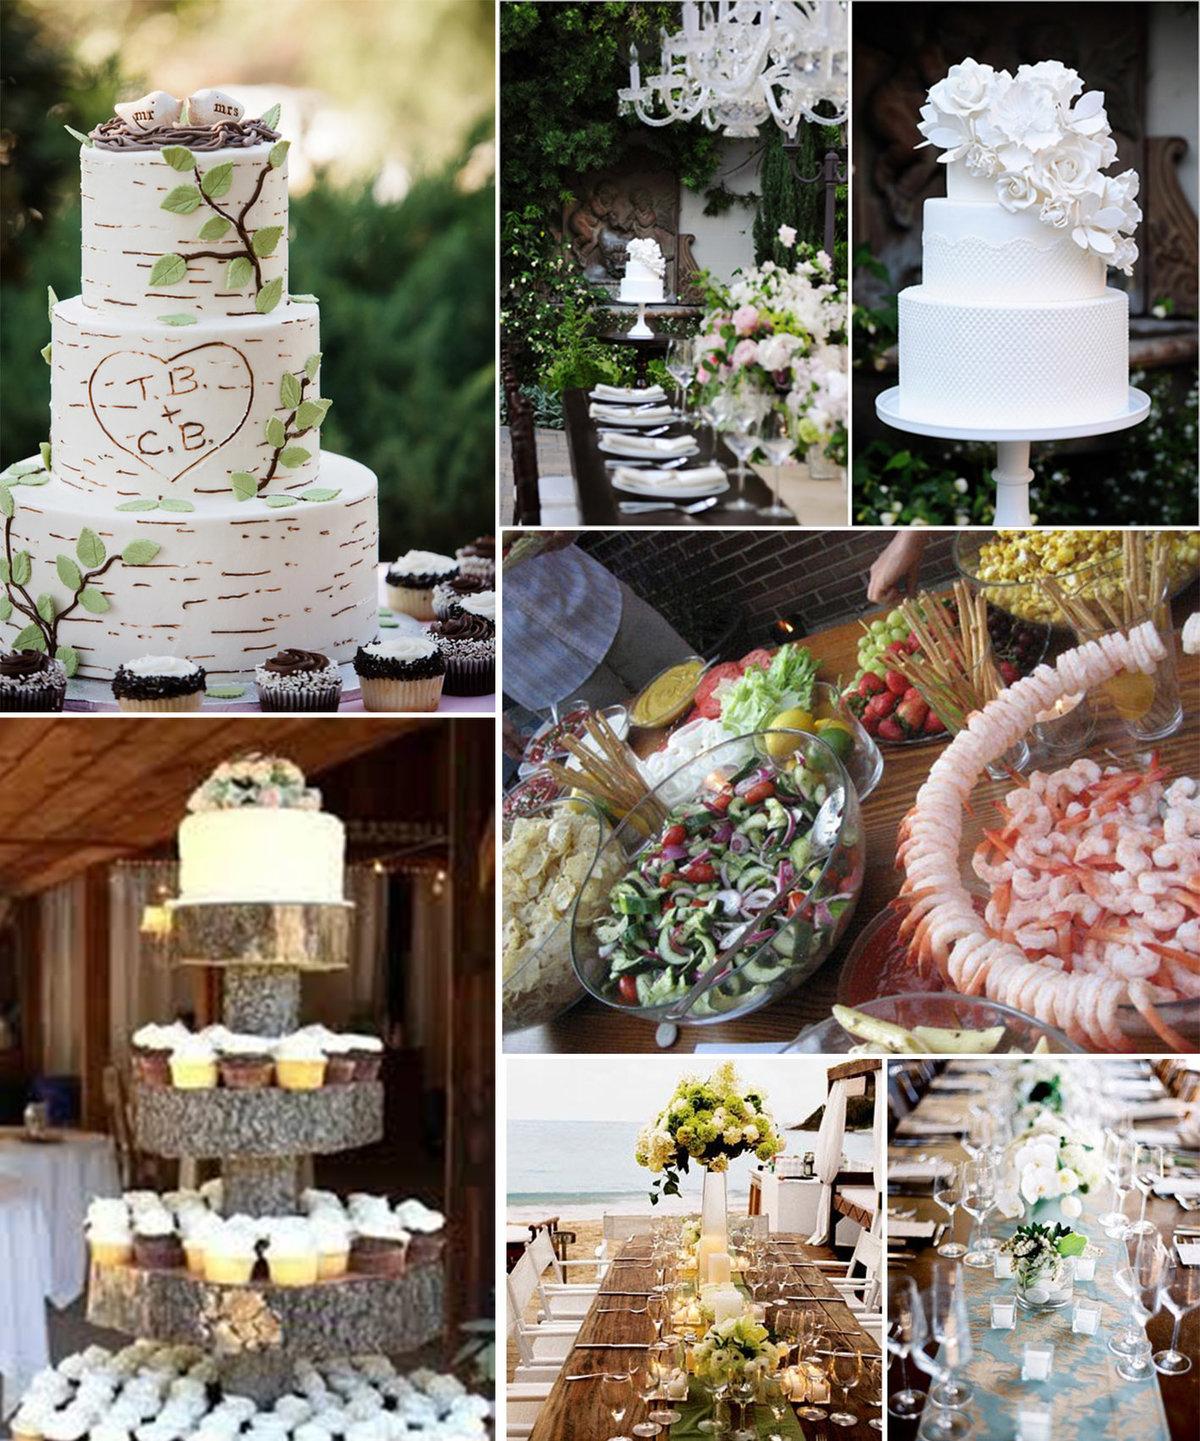 "Backyard Wedding Cake Ideas backyard wedding cake ideas melitafiore"" — card from user aya alzhan"